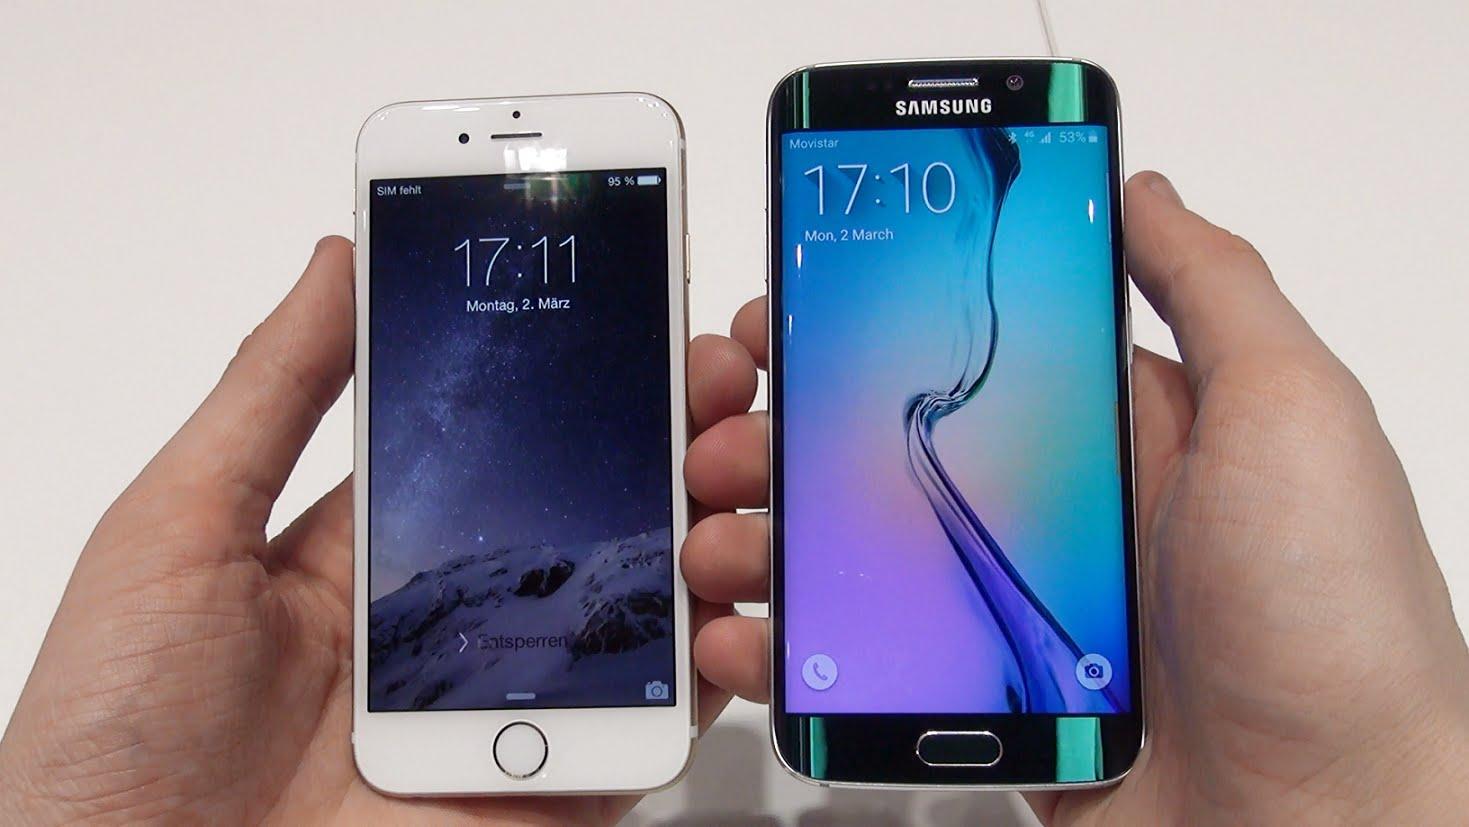 Samsung Galaxy s6 Edge + Vs iPhone 6s Plus